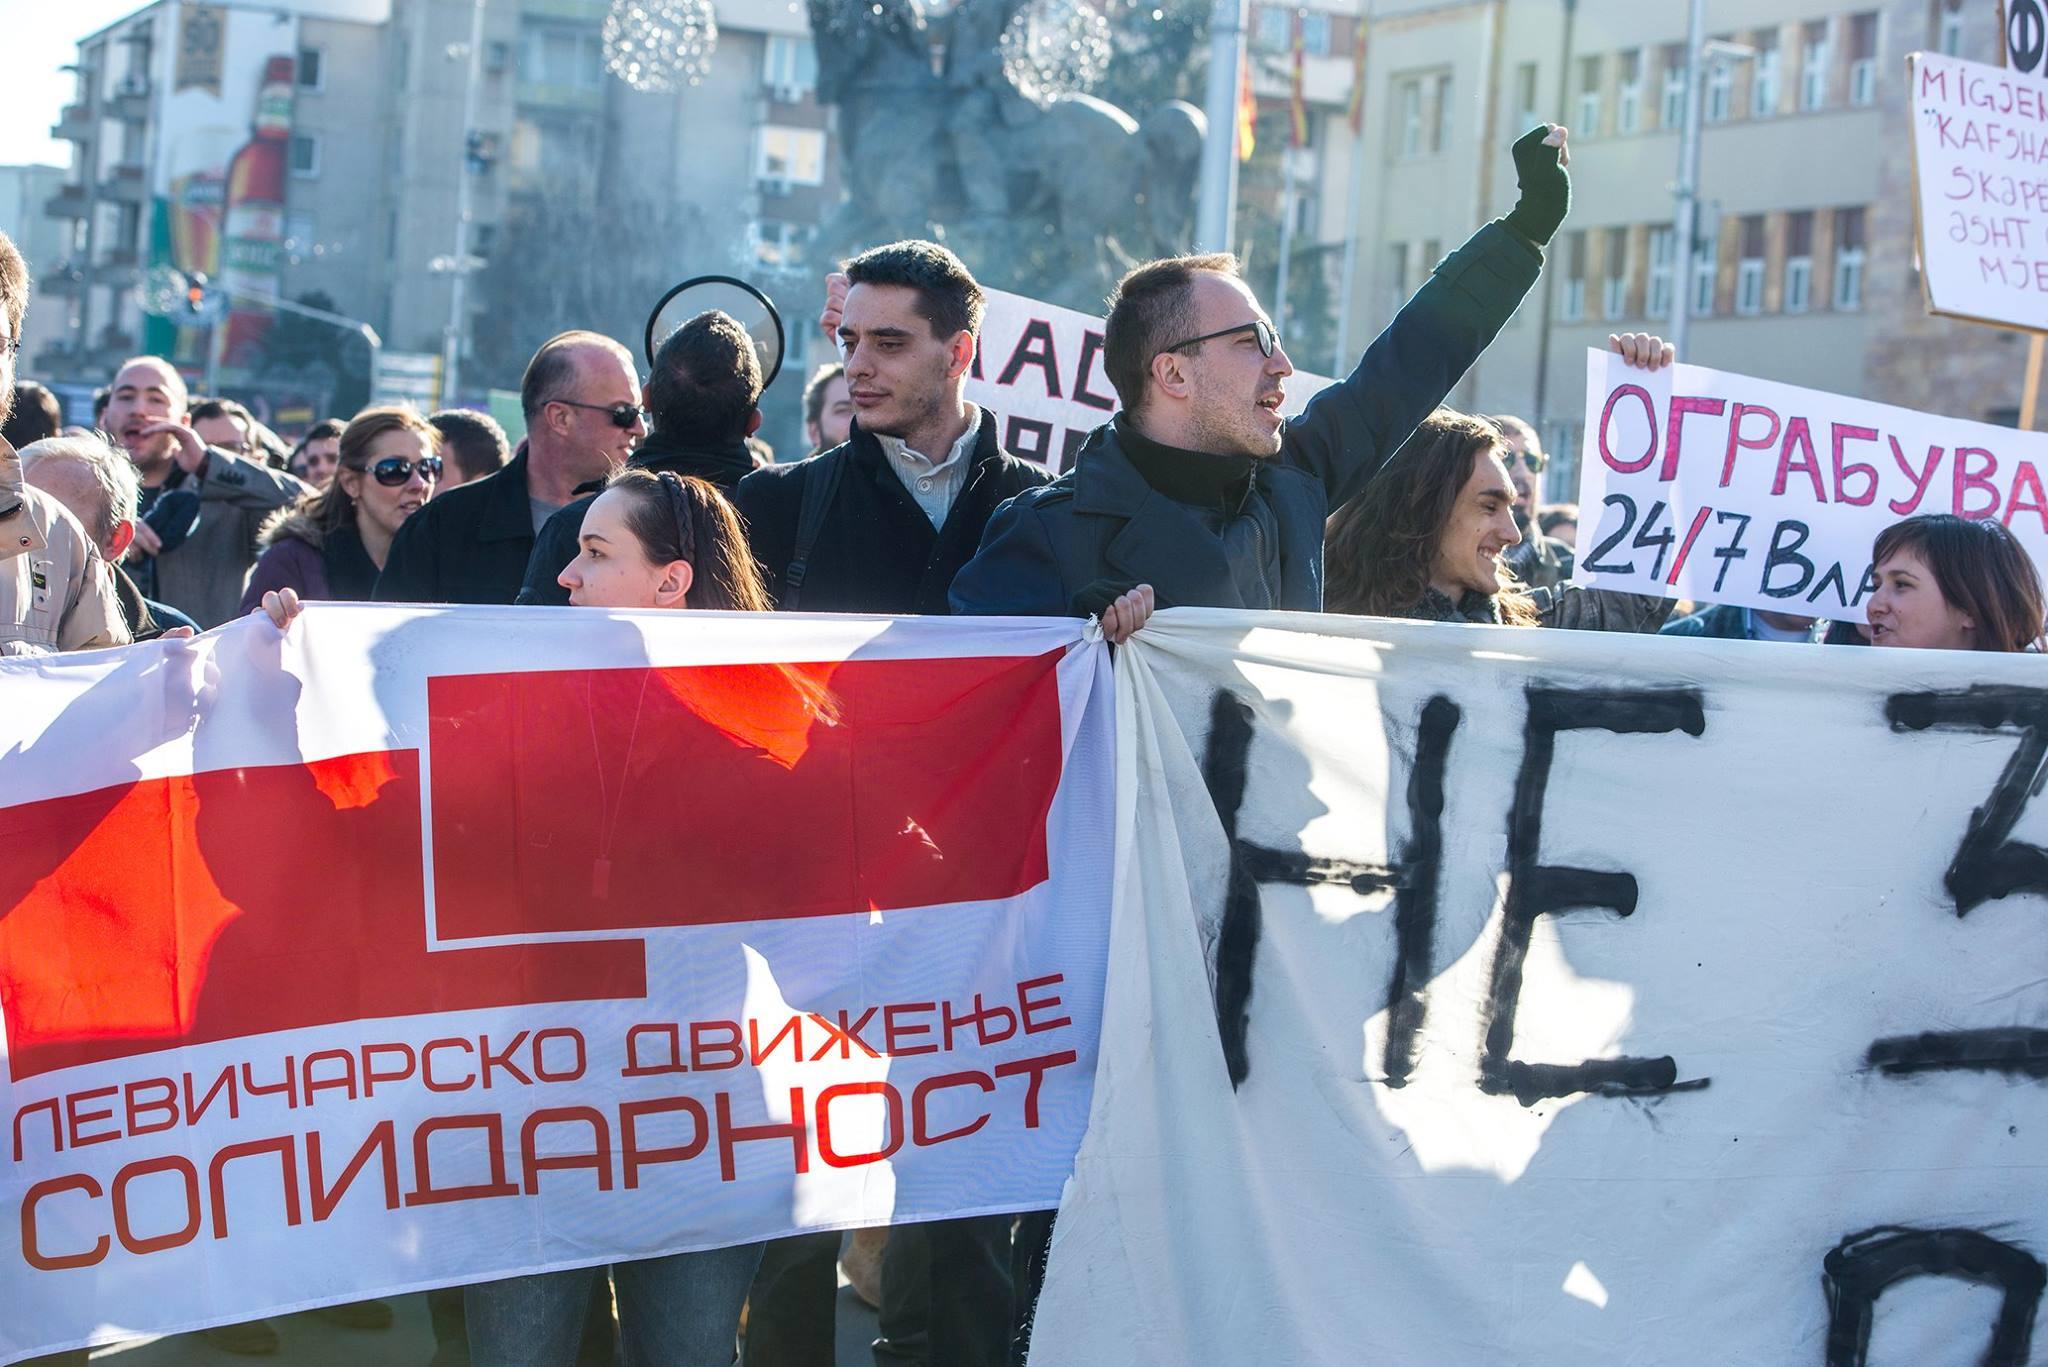 foto: Solidarnost